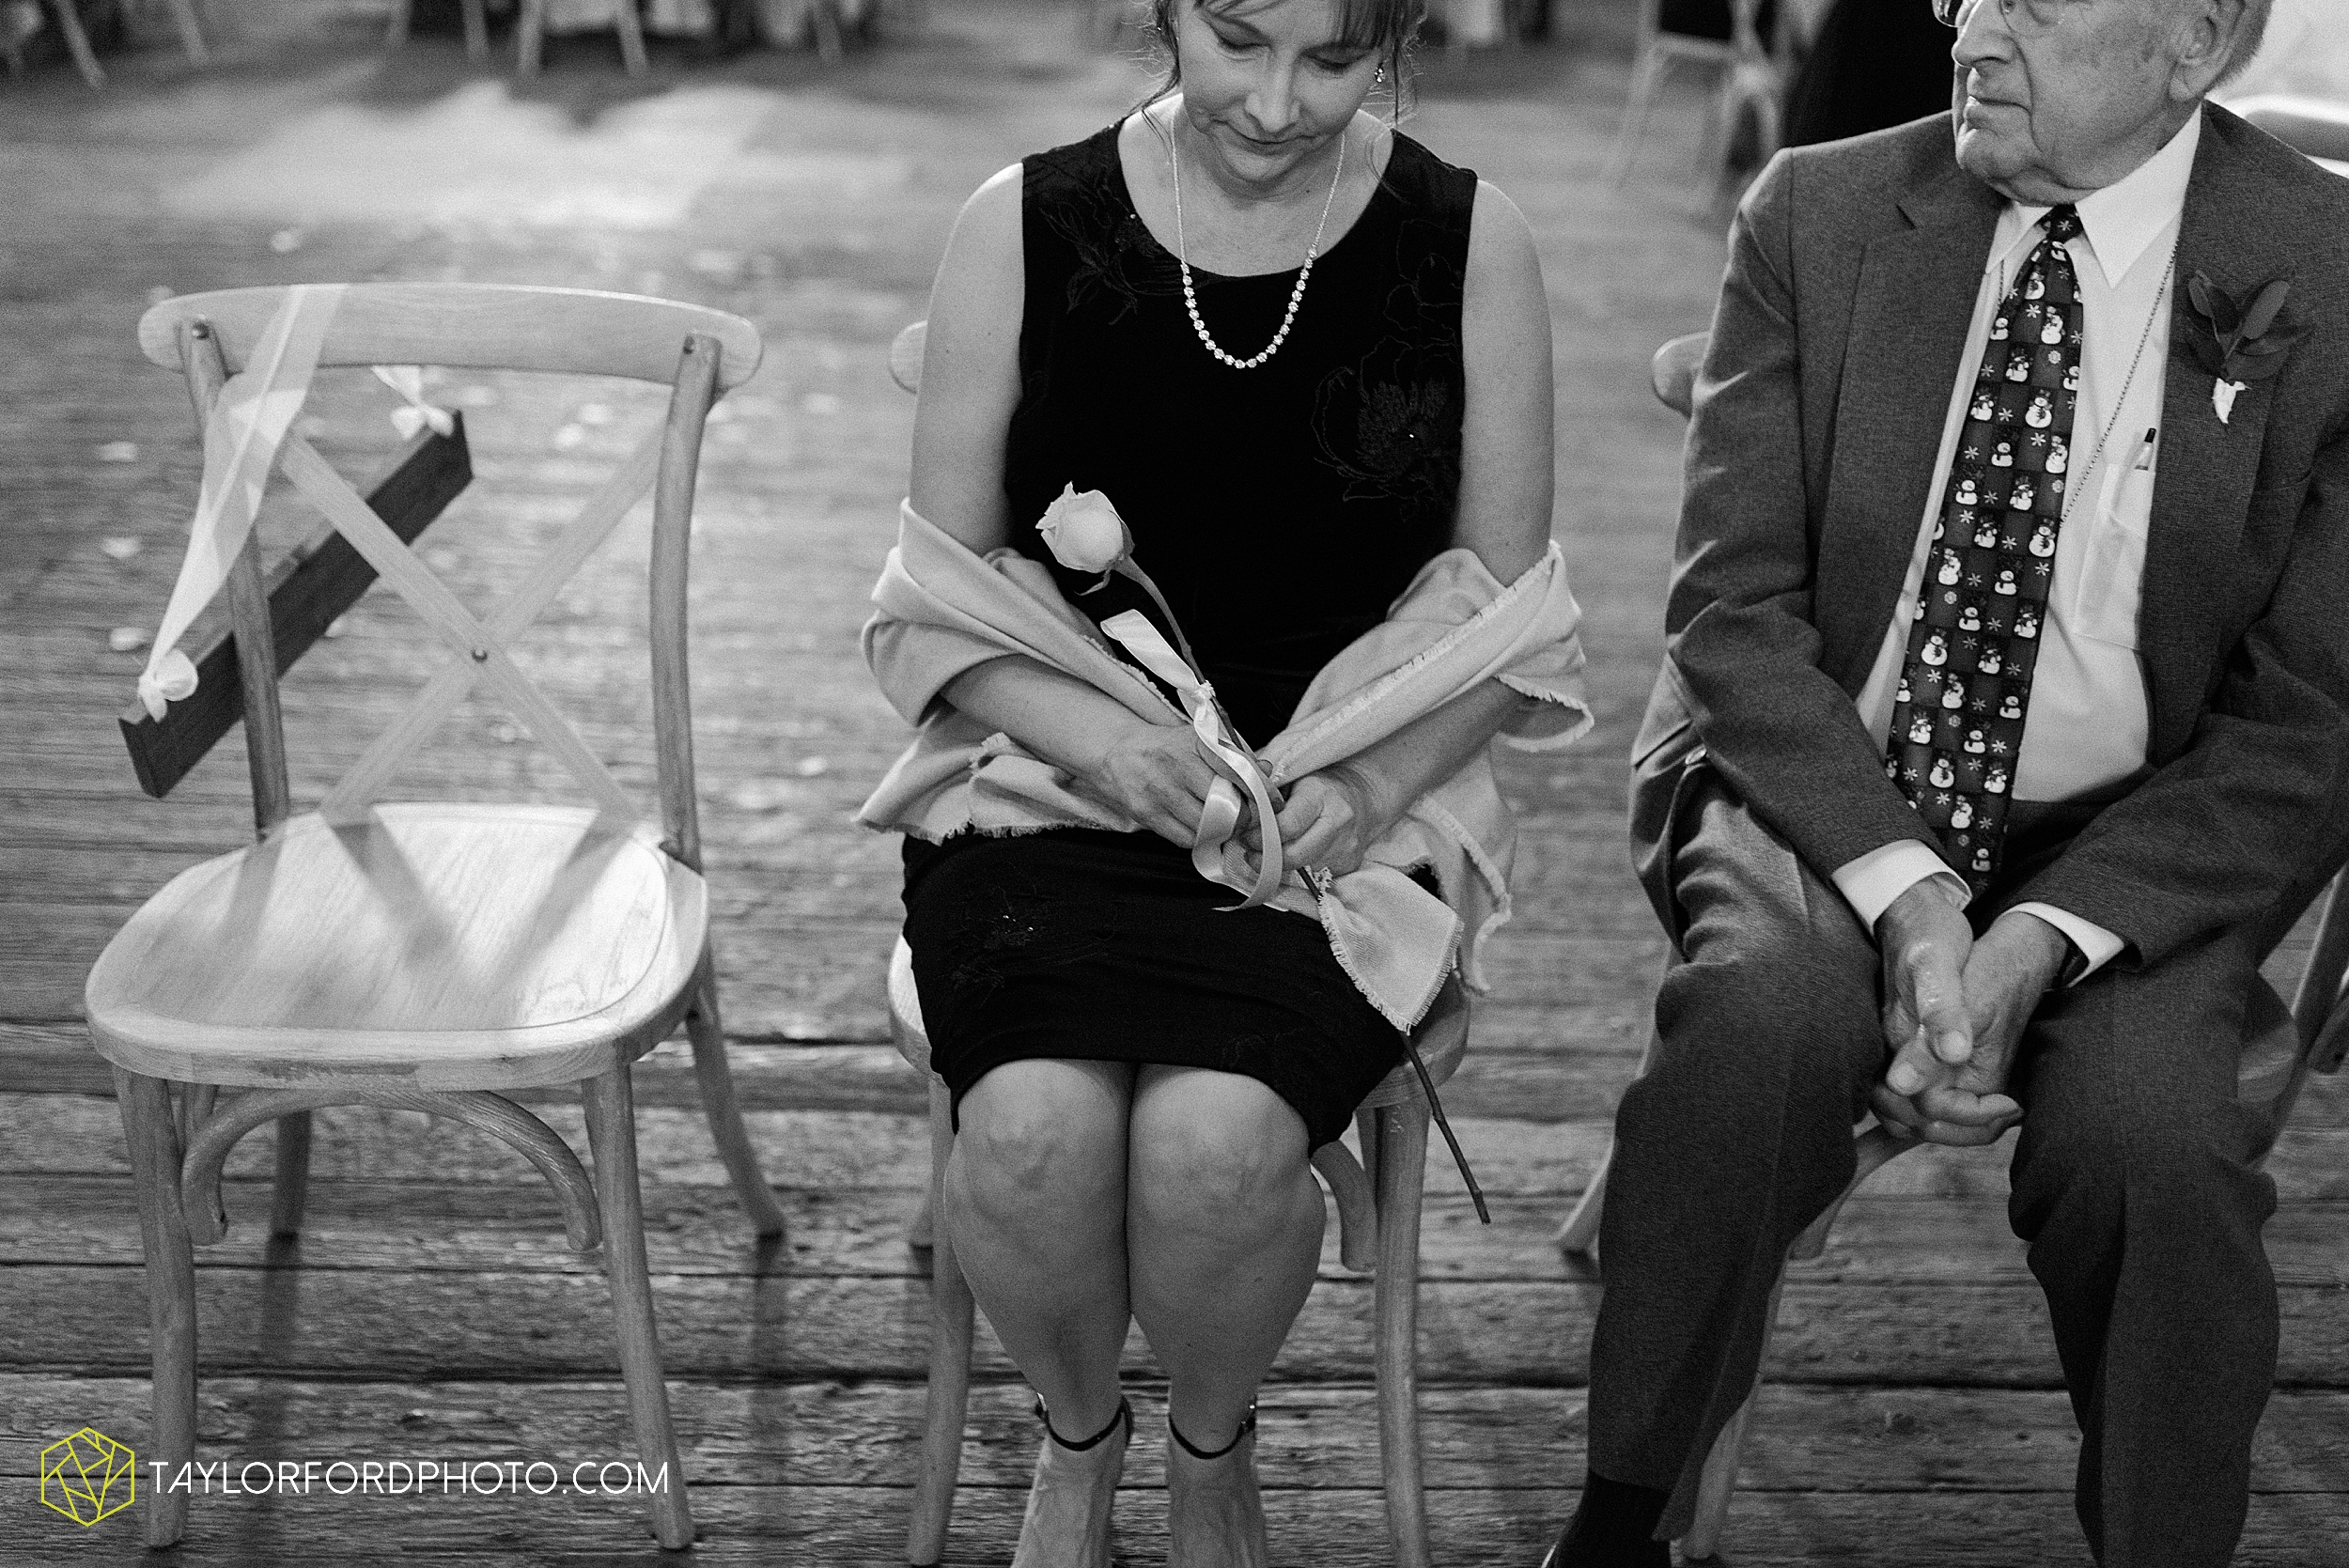 marissa-nicole-nick-daeger-orrmont-estate-farm-wedding-piqua-dayton-troy-ohio-fall-photographer-taylor-ford-photography_1522.jpg